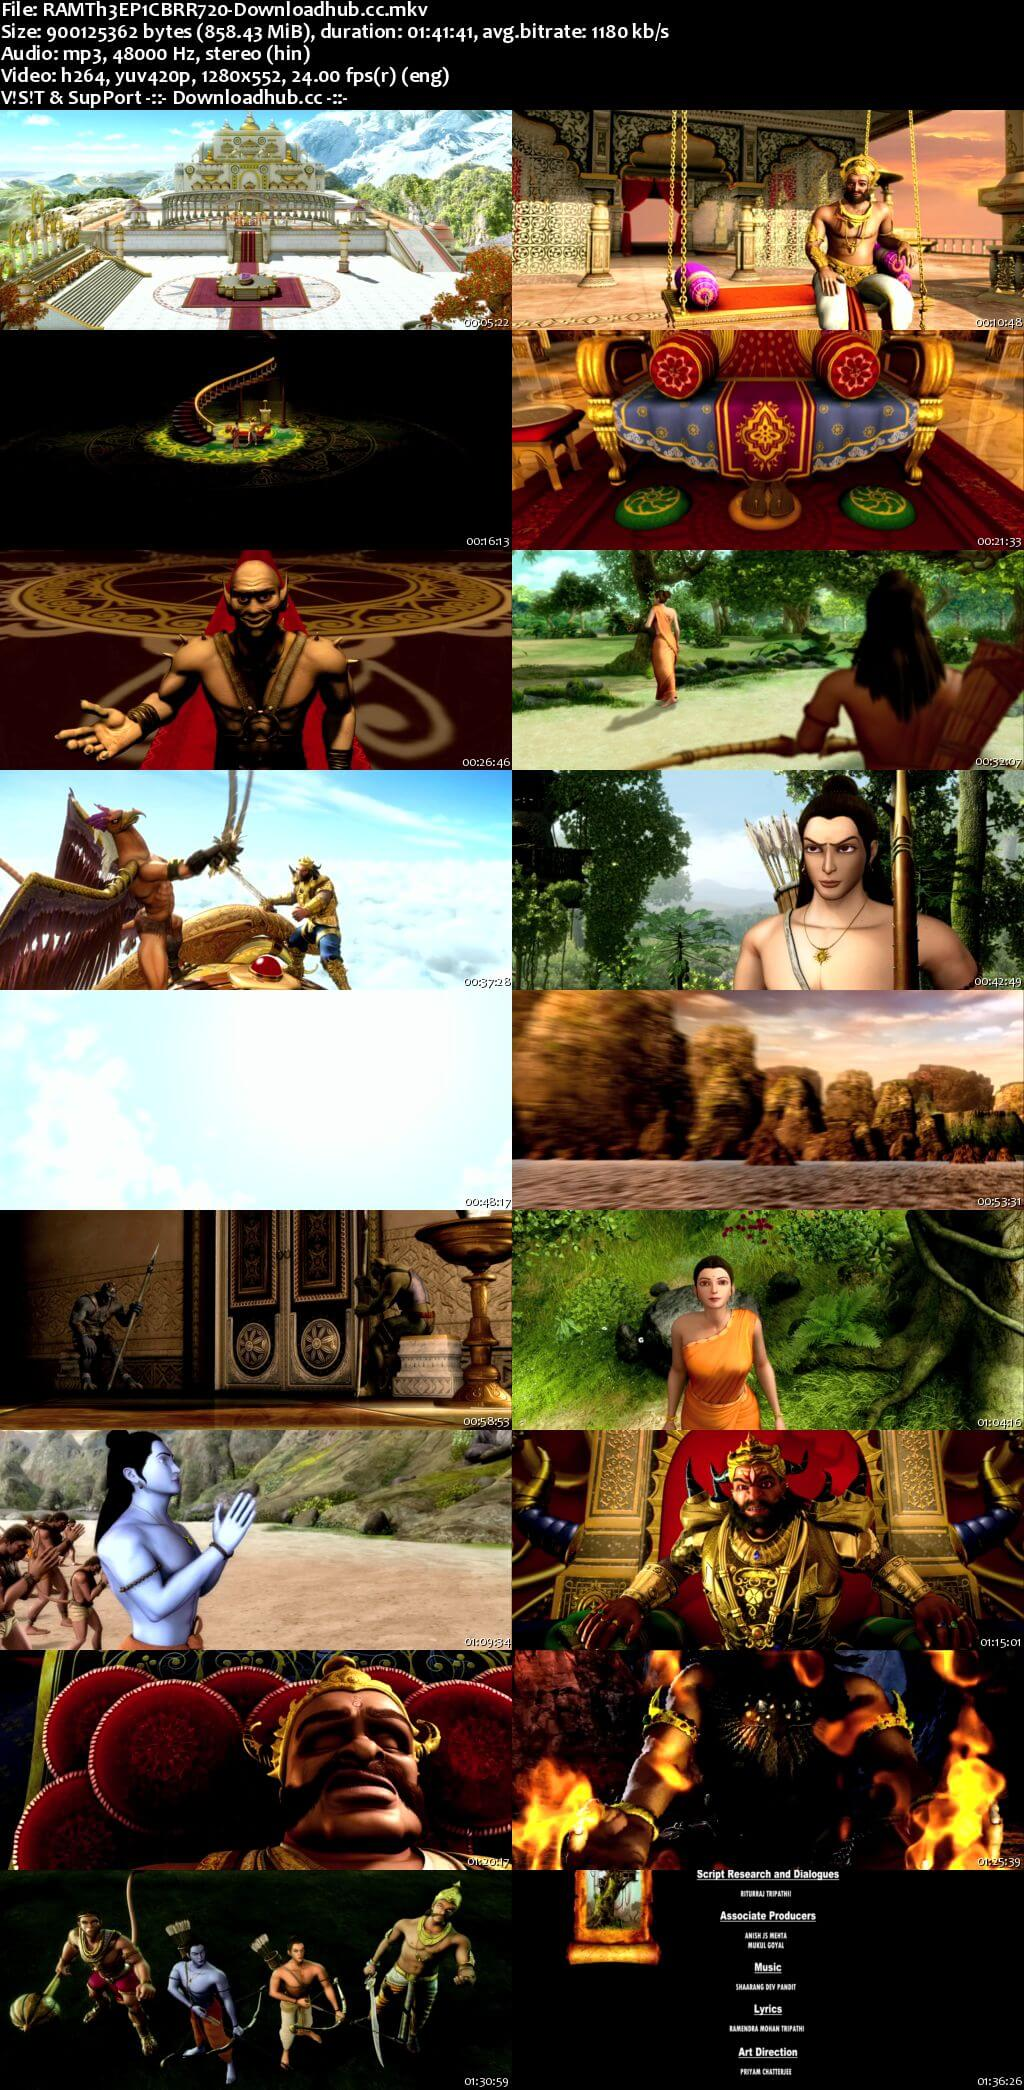 Ramayana The Epic 2010 Hindi 720p BluRay ESubs